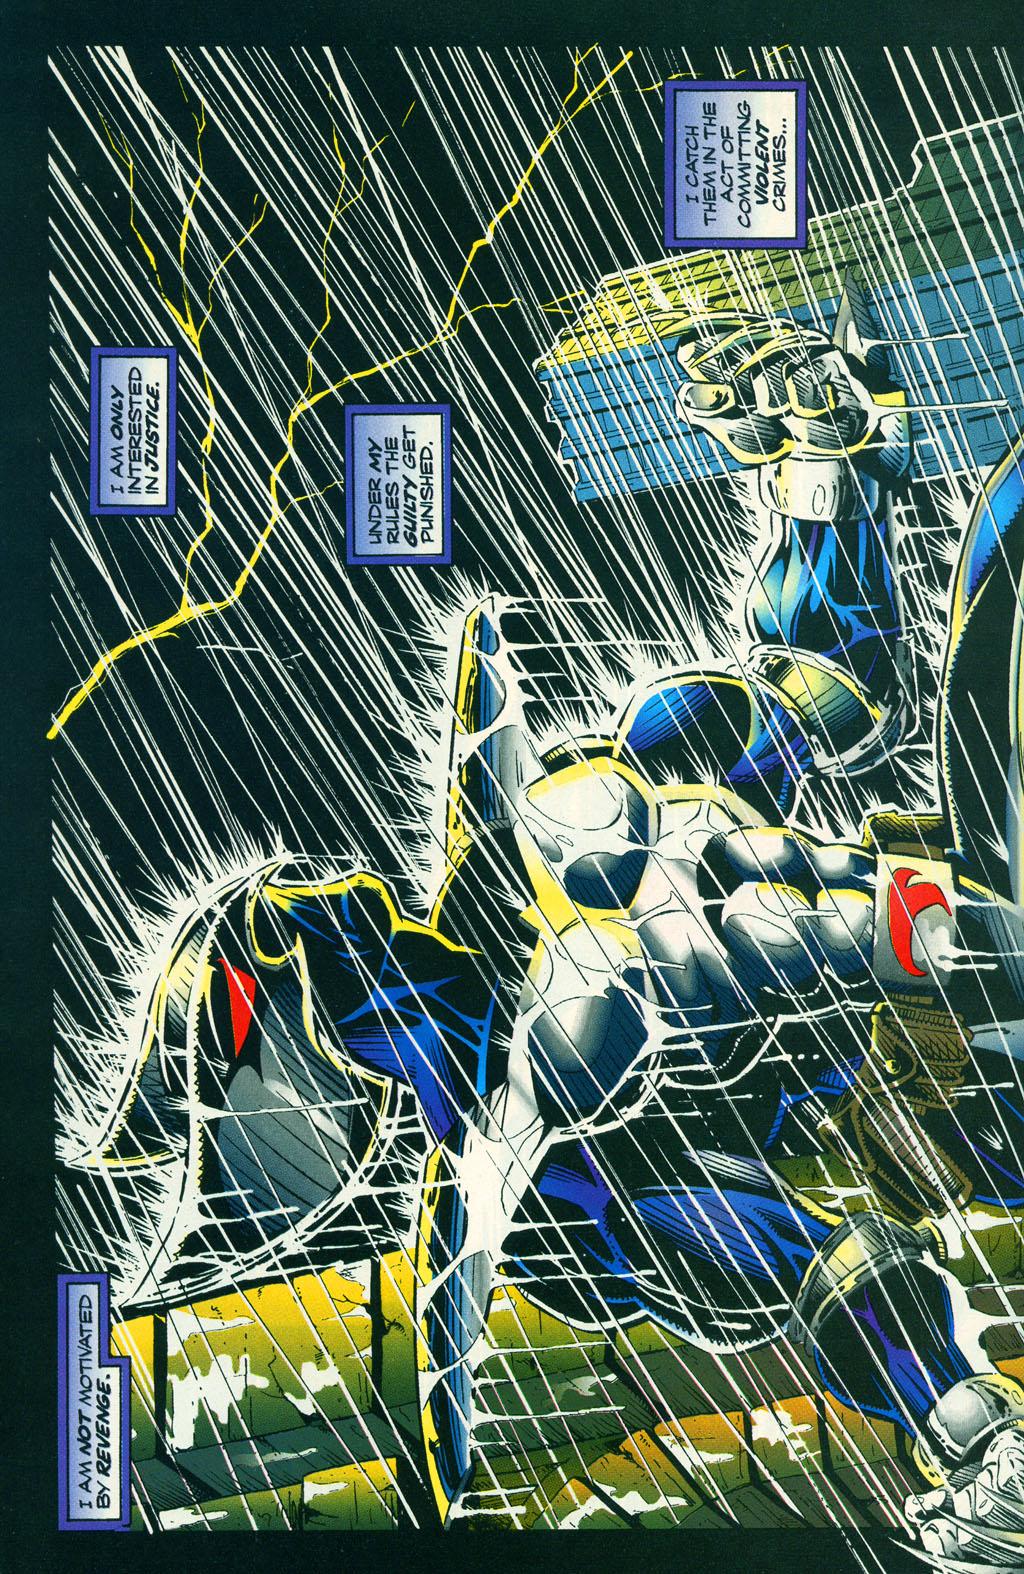 Read online ShadowHawk comic -  Issue #6 - 5